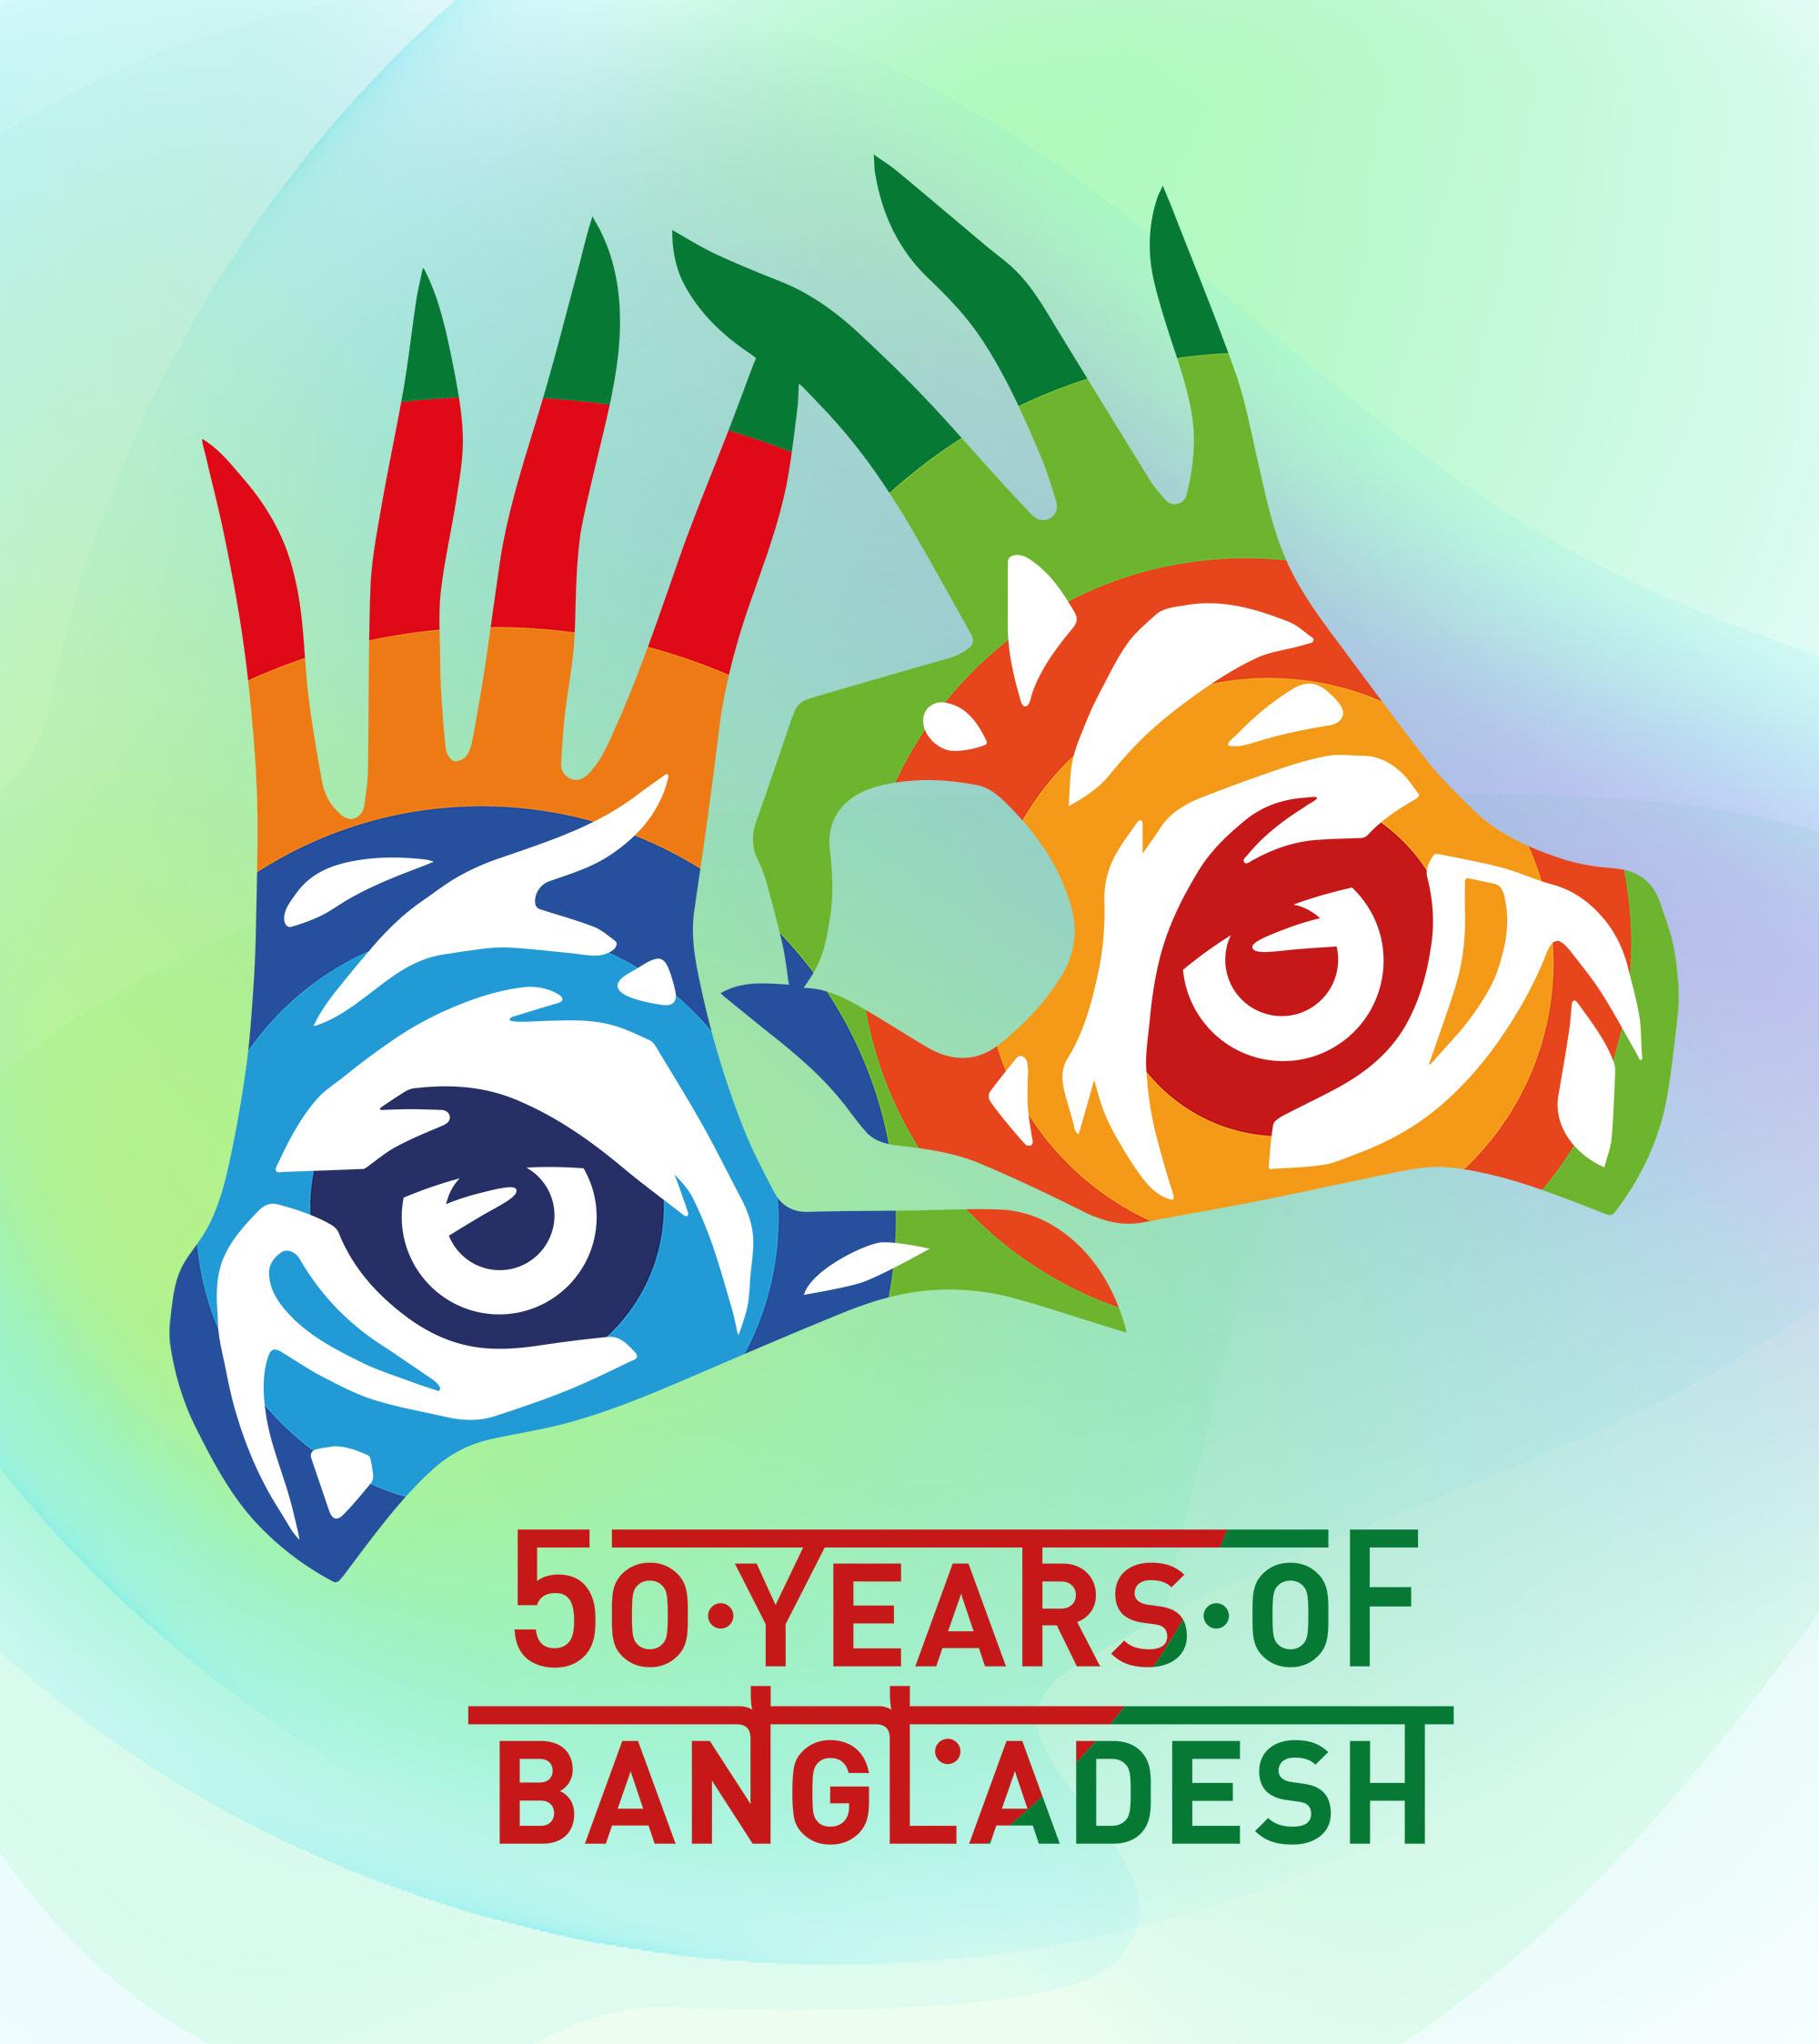 trommer 50 years of bangladesh logo english